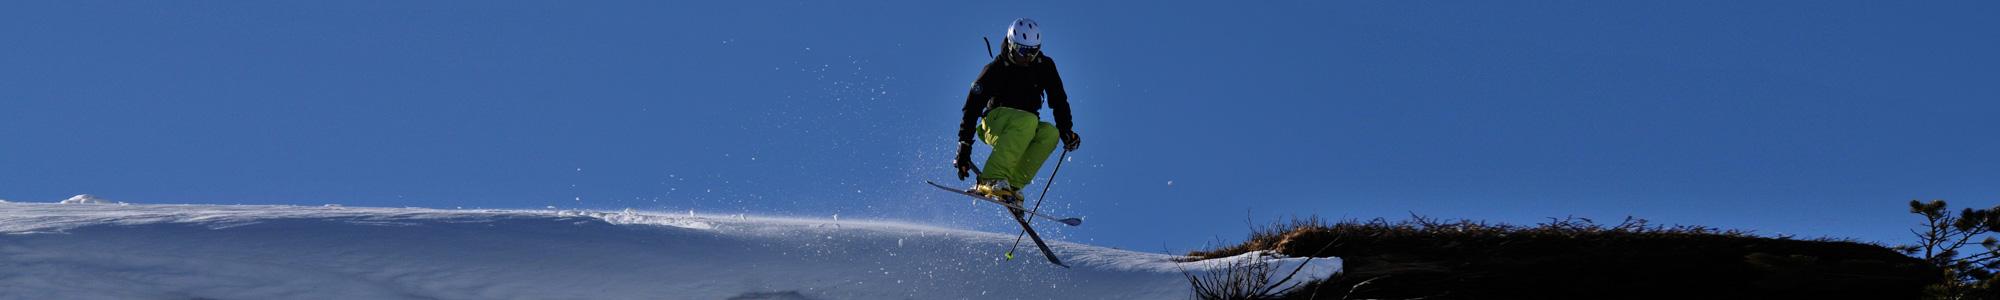 slide-ski-01